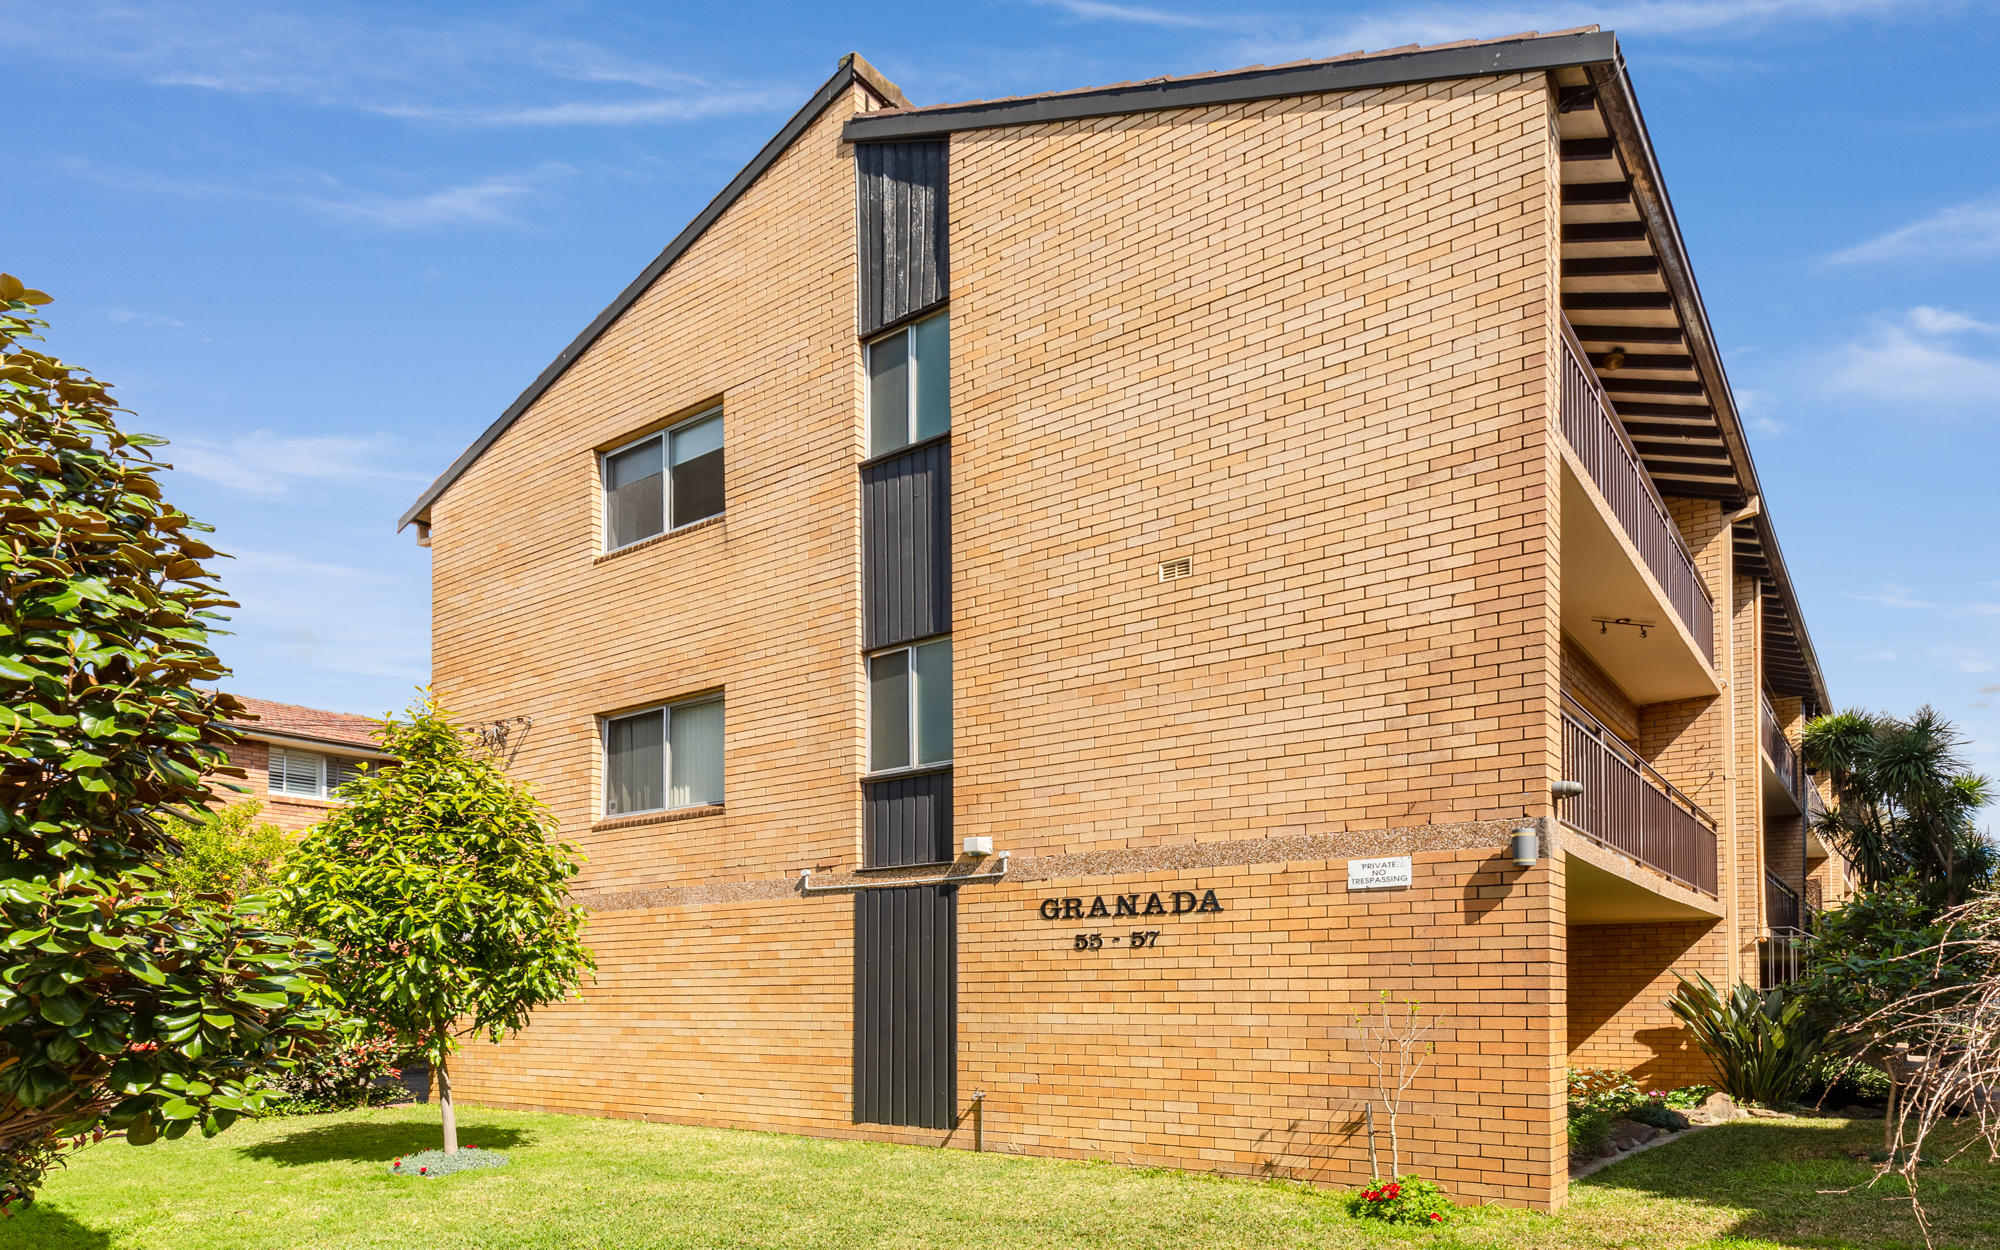 3/55-57 Wardell Road, Petersham